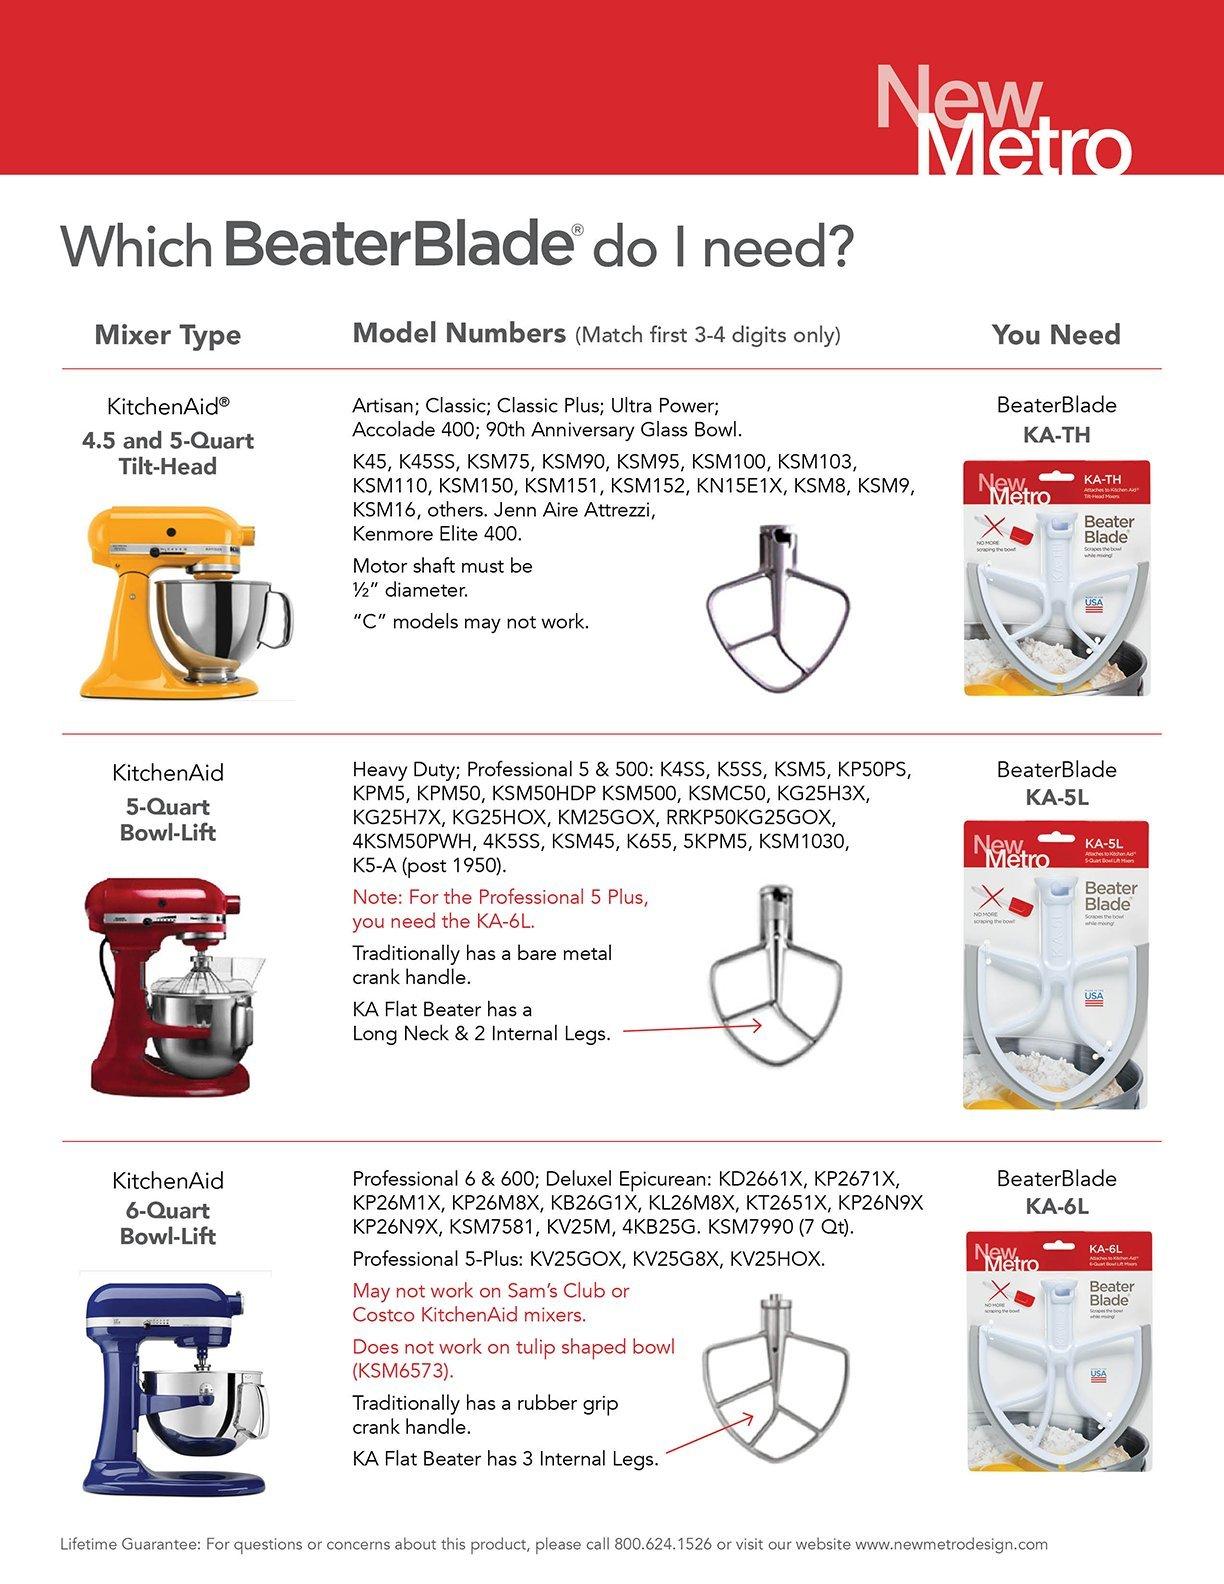 Original BeaterBlade for KitchenAid 6-Quart Bowl Lift Mixer, KA-6L, White, Made in USA by New Metro Design (Image #6)